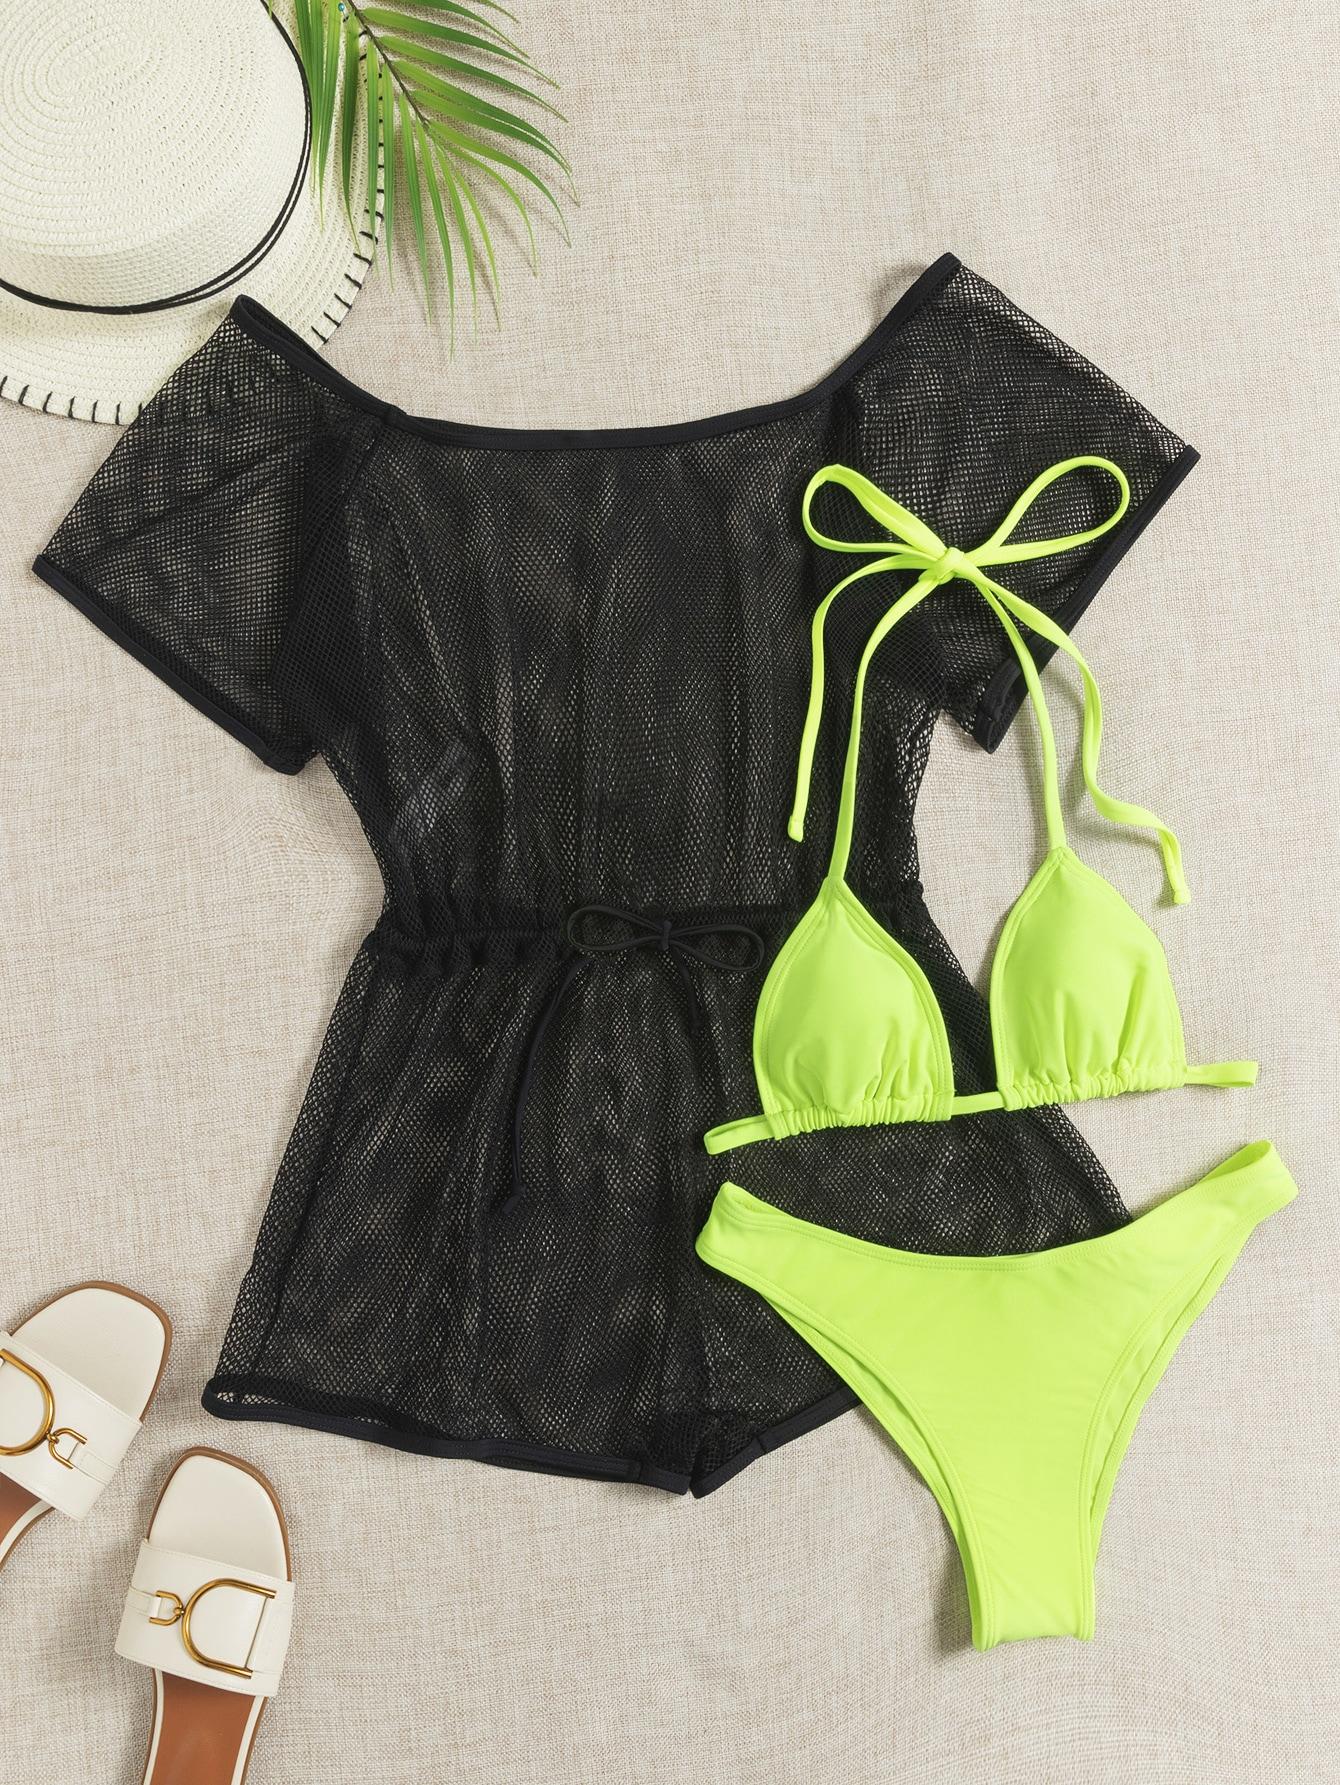 3pack Neon Lime Triangle Bikini Swimsuit With Fishnet Romper thumbnail